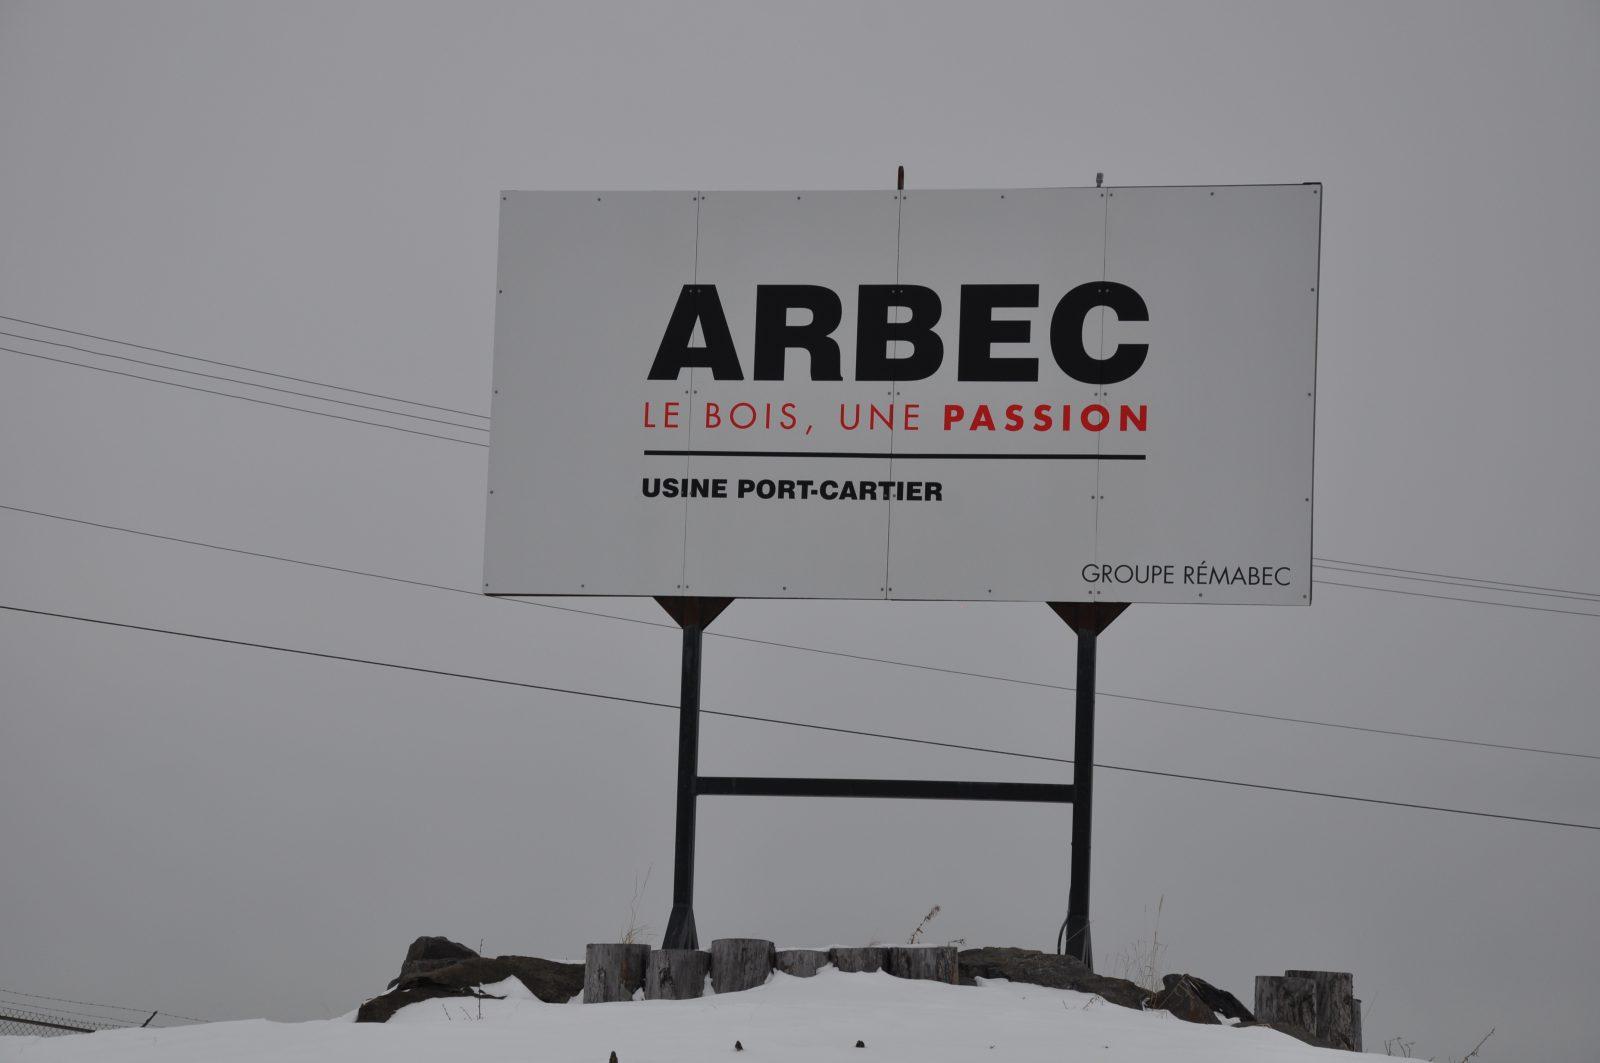 Alain Thibault inquiet des mises à pied temporaires chez Arbec